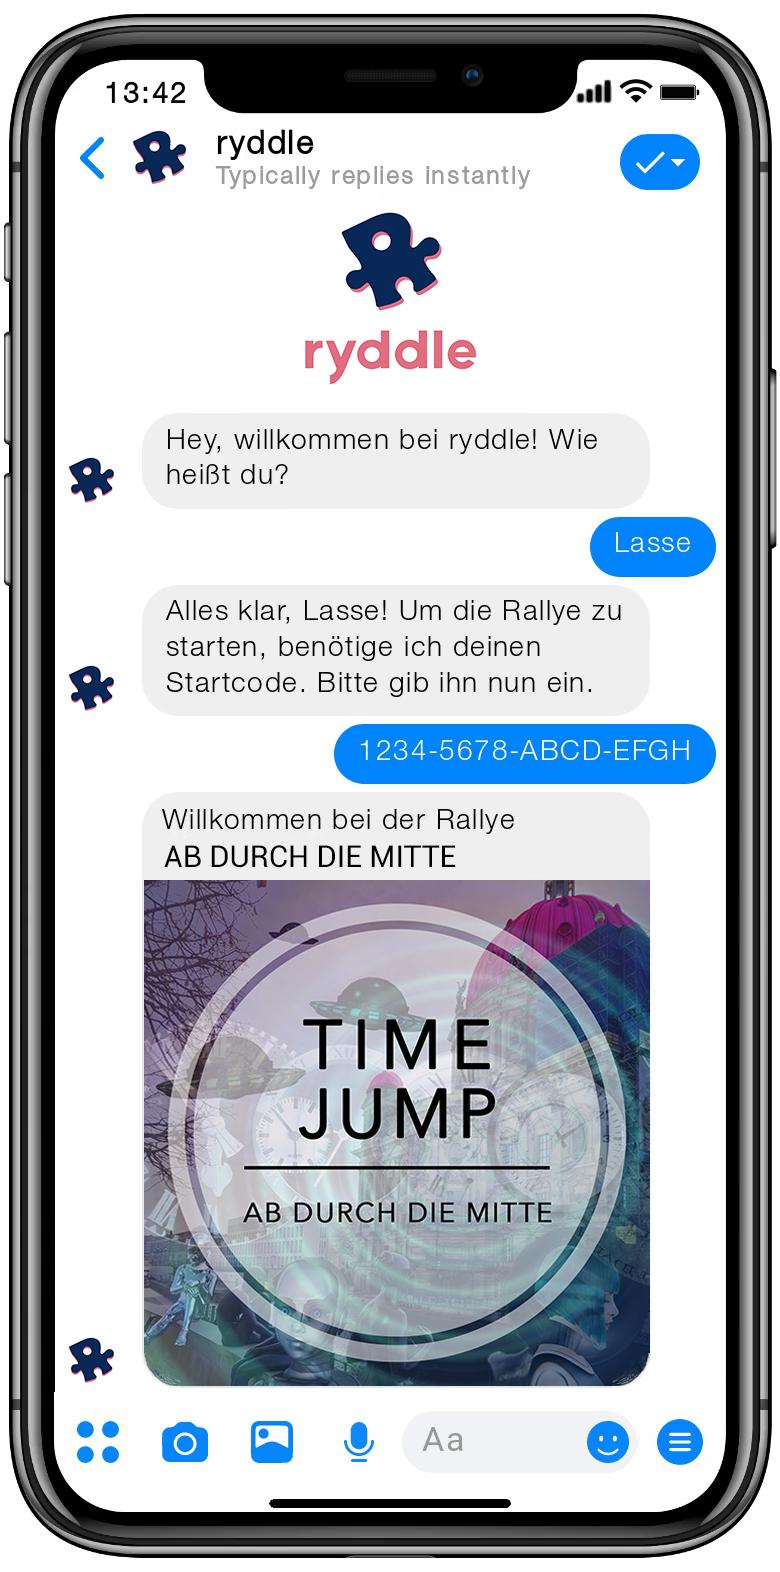 Stadtrallye Berlin - Vorschau der Smartphone Schnitzeljagd